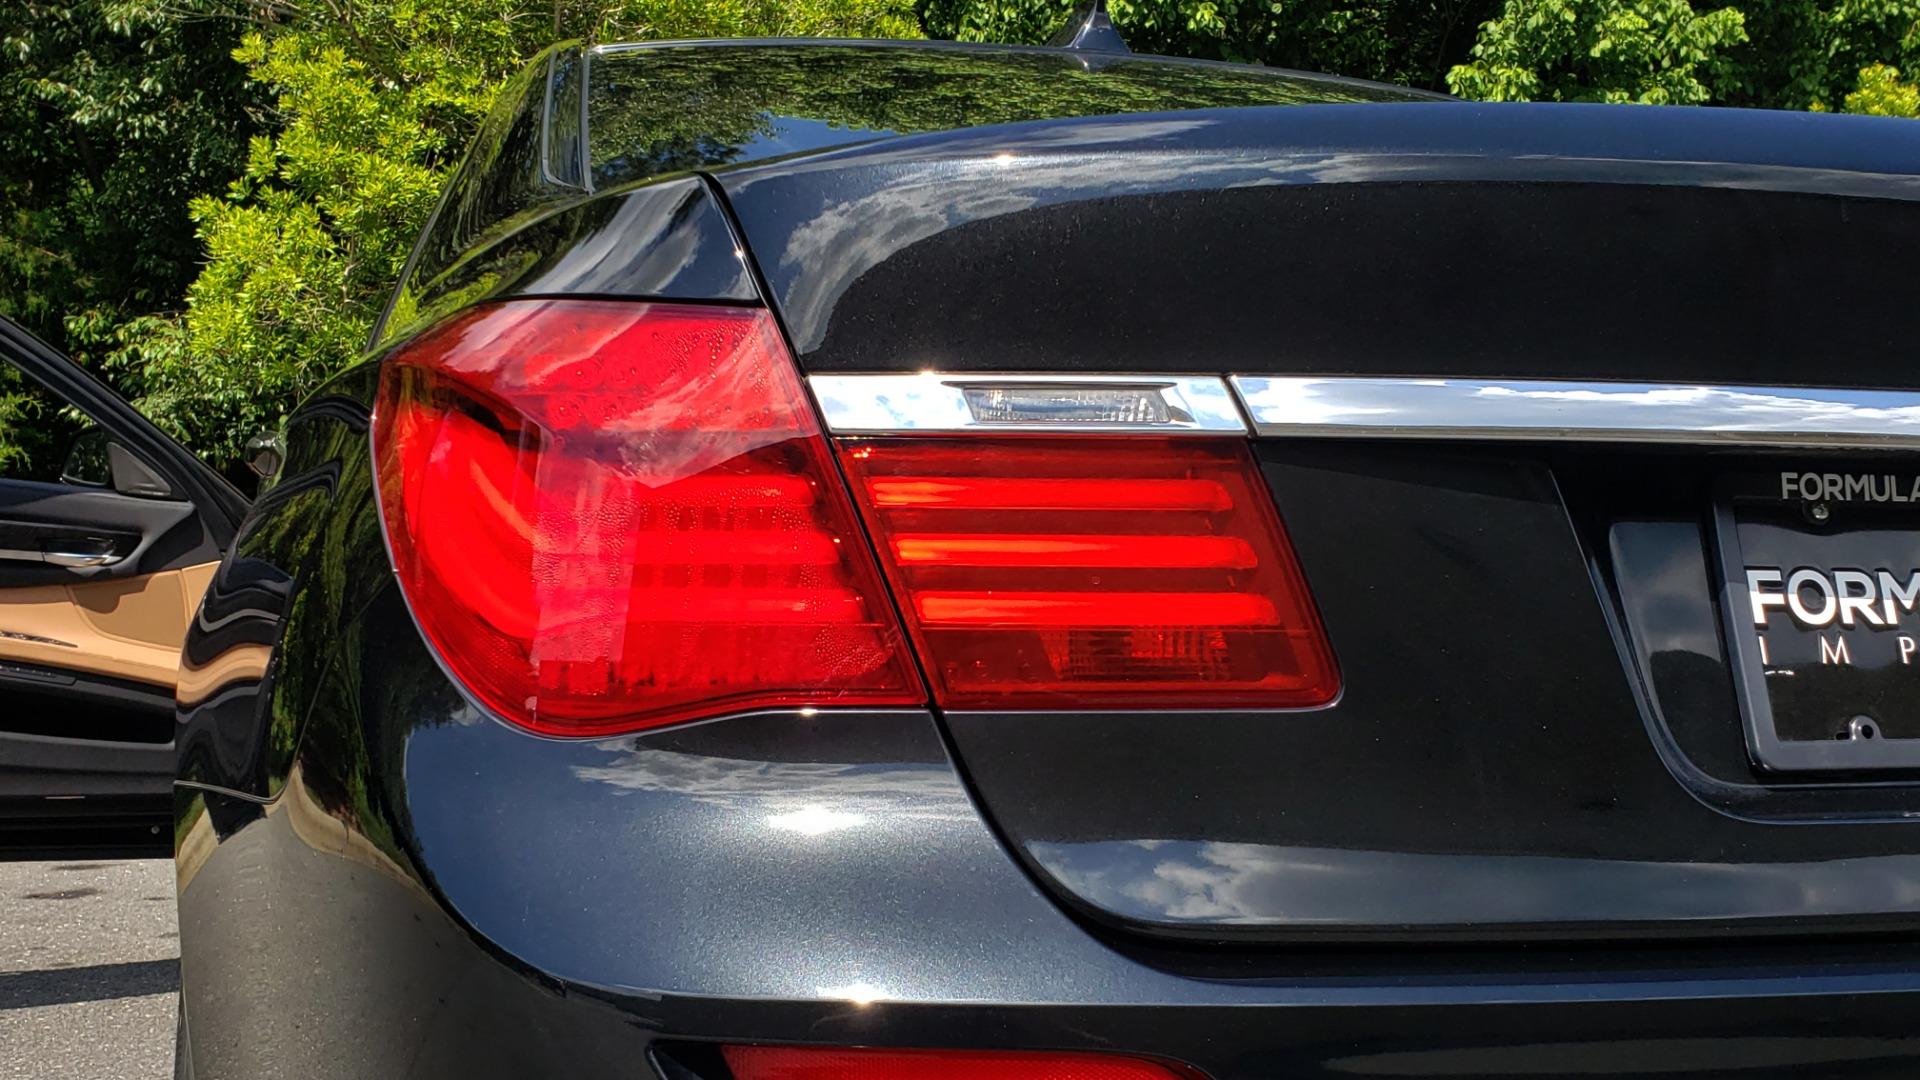 Used 2014 BMW 7 SERIES 750LI M-SPORT / EXEC PKG / DRVR ASST / LIGHTING / NAV / SUNROOF for sale Sold at Formula Imports in Charlotte NC 28227 26